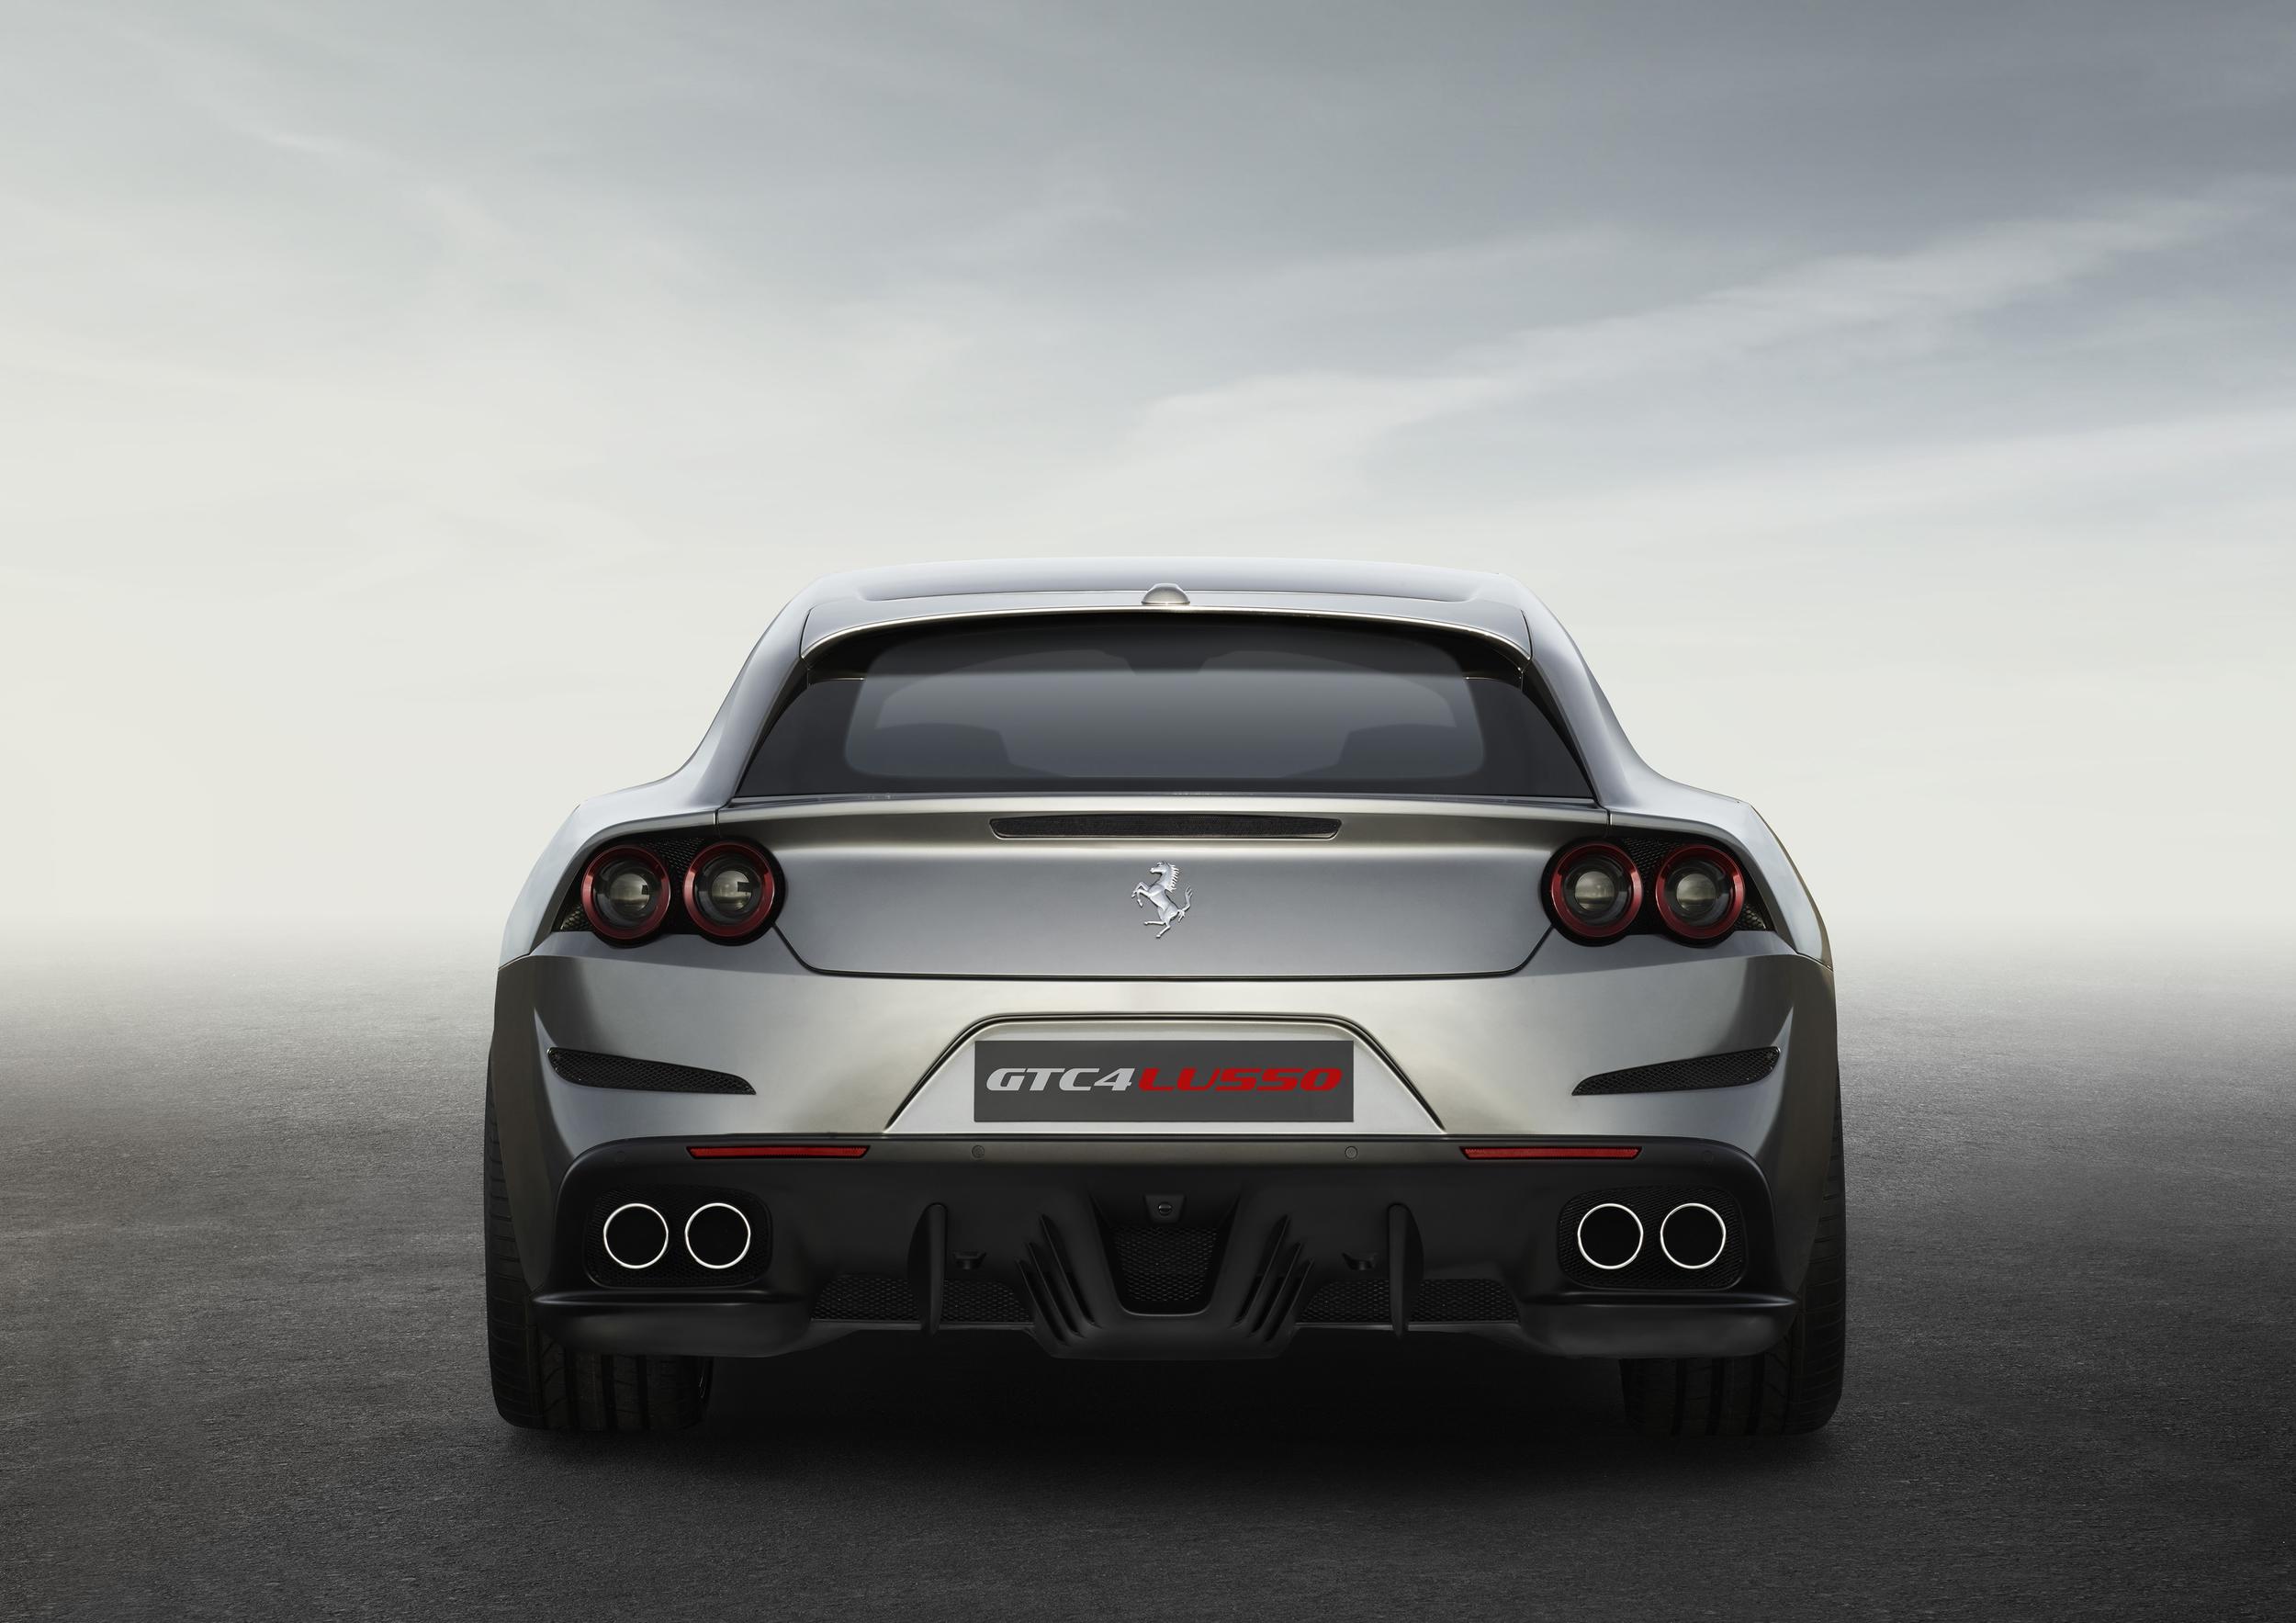 ferrari-gtc4lusso-rear-lr-1